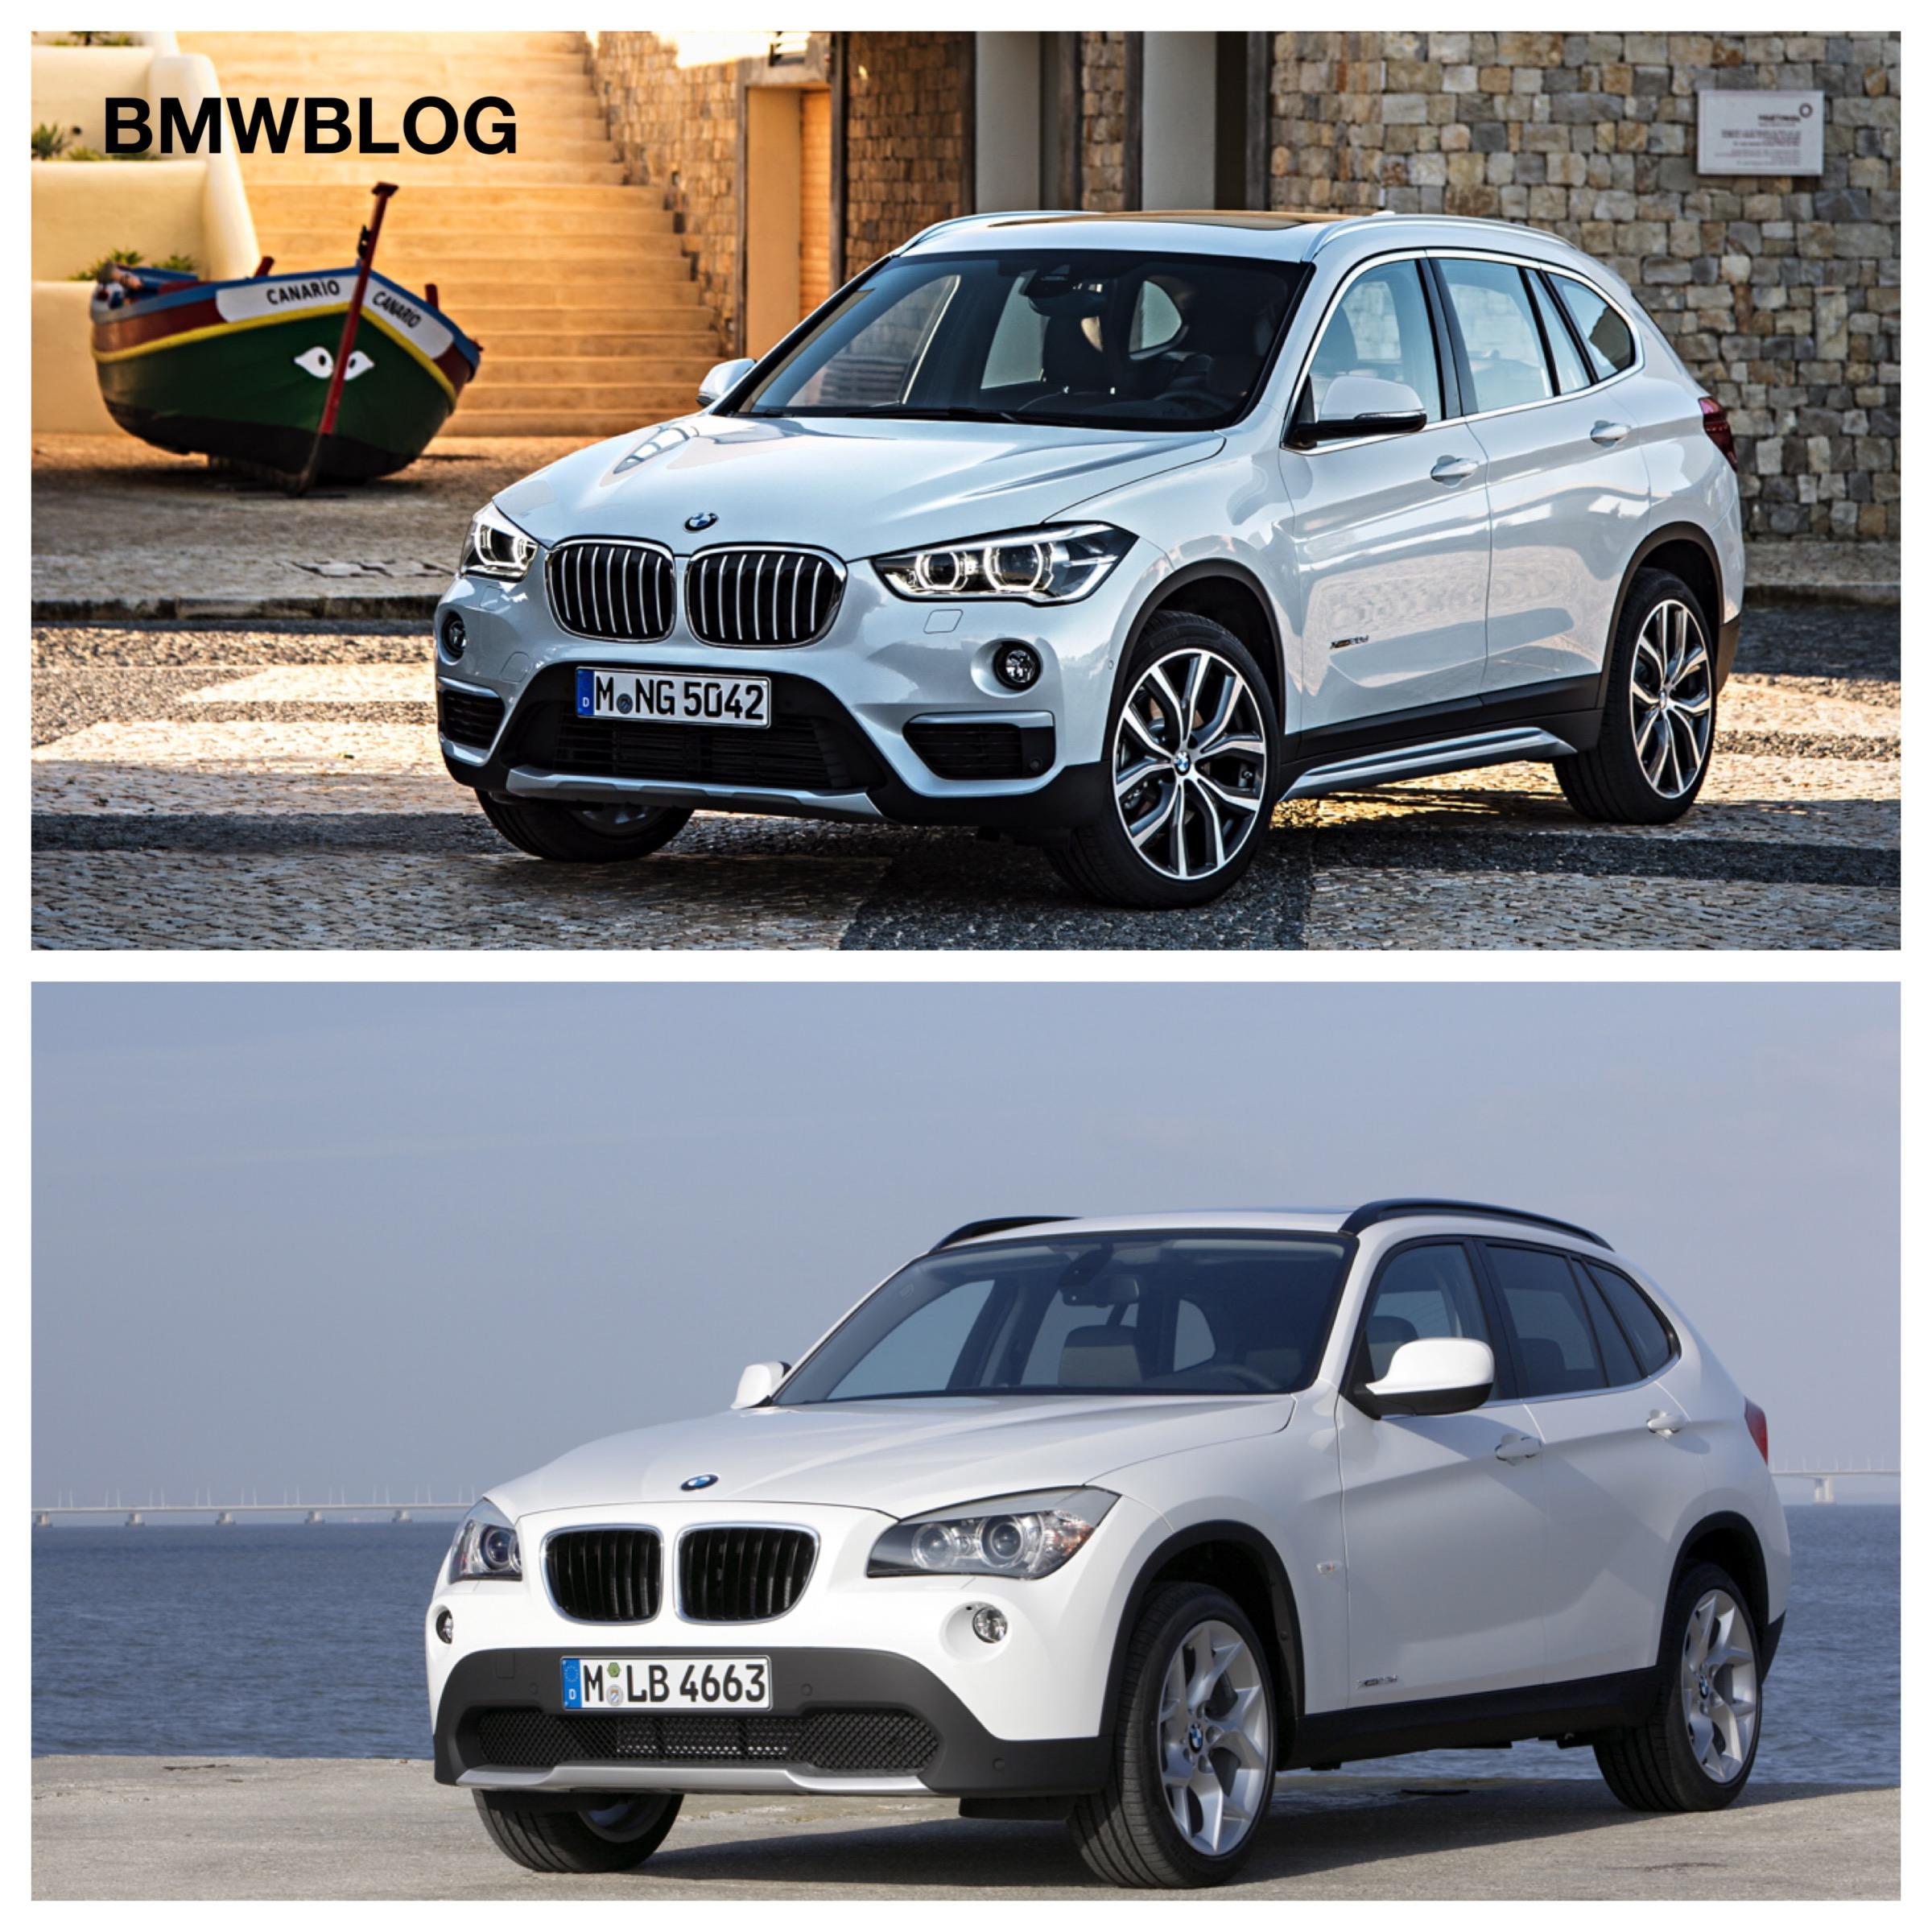 Bmw X1 Vs X3 >> E84 BMW X1 vs. 2016 BMW X1 F48 - Photo Comparison